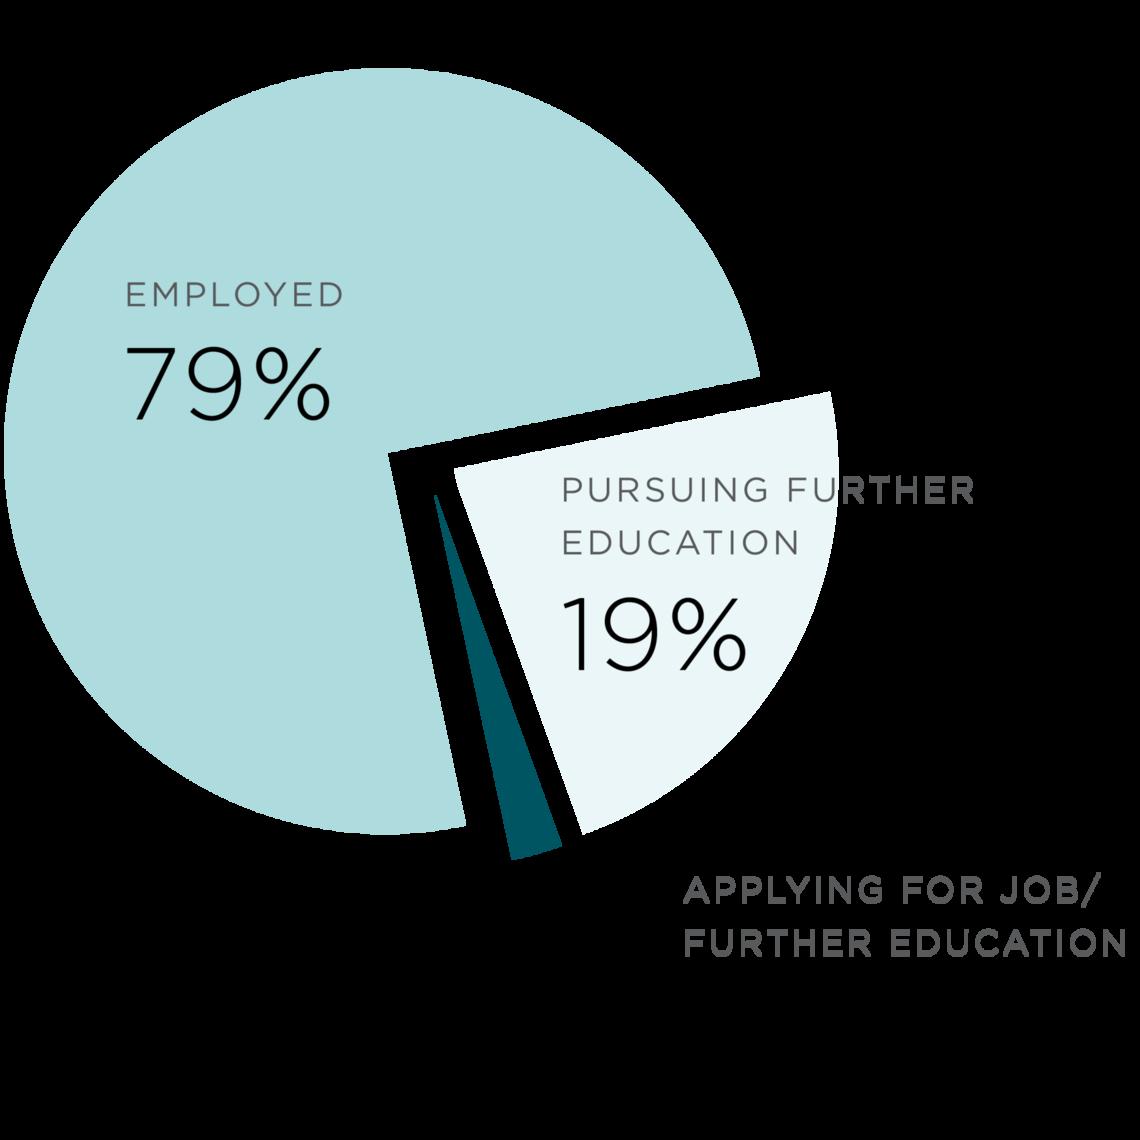 2016 ospgd employment chart